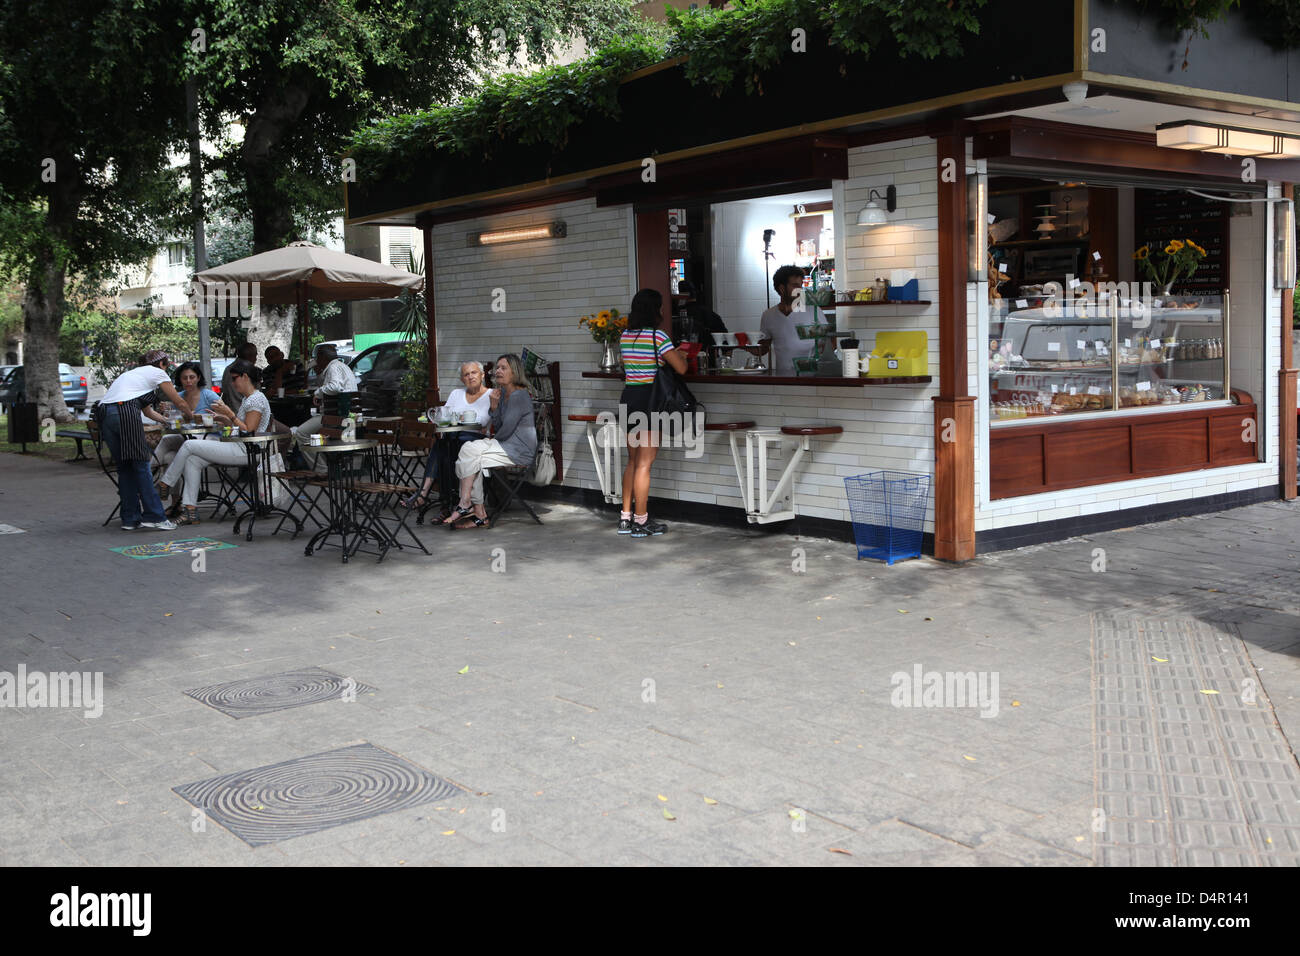 Israel, Tel Aviv, an outdoor coffee bar in Ben-Zion Boulevard - Stock Image